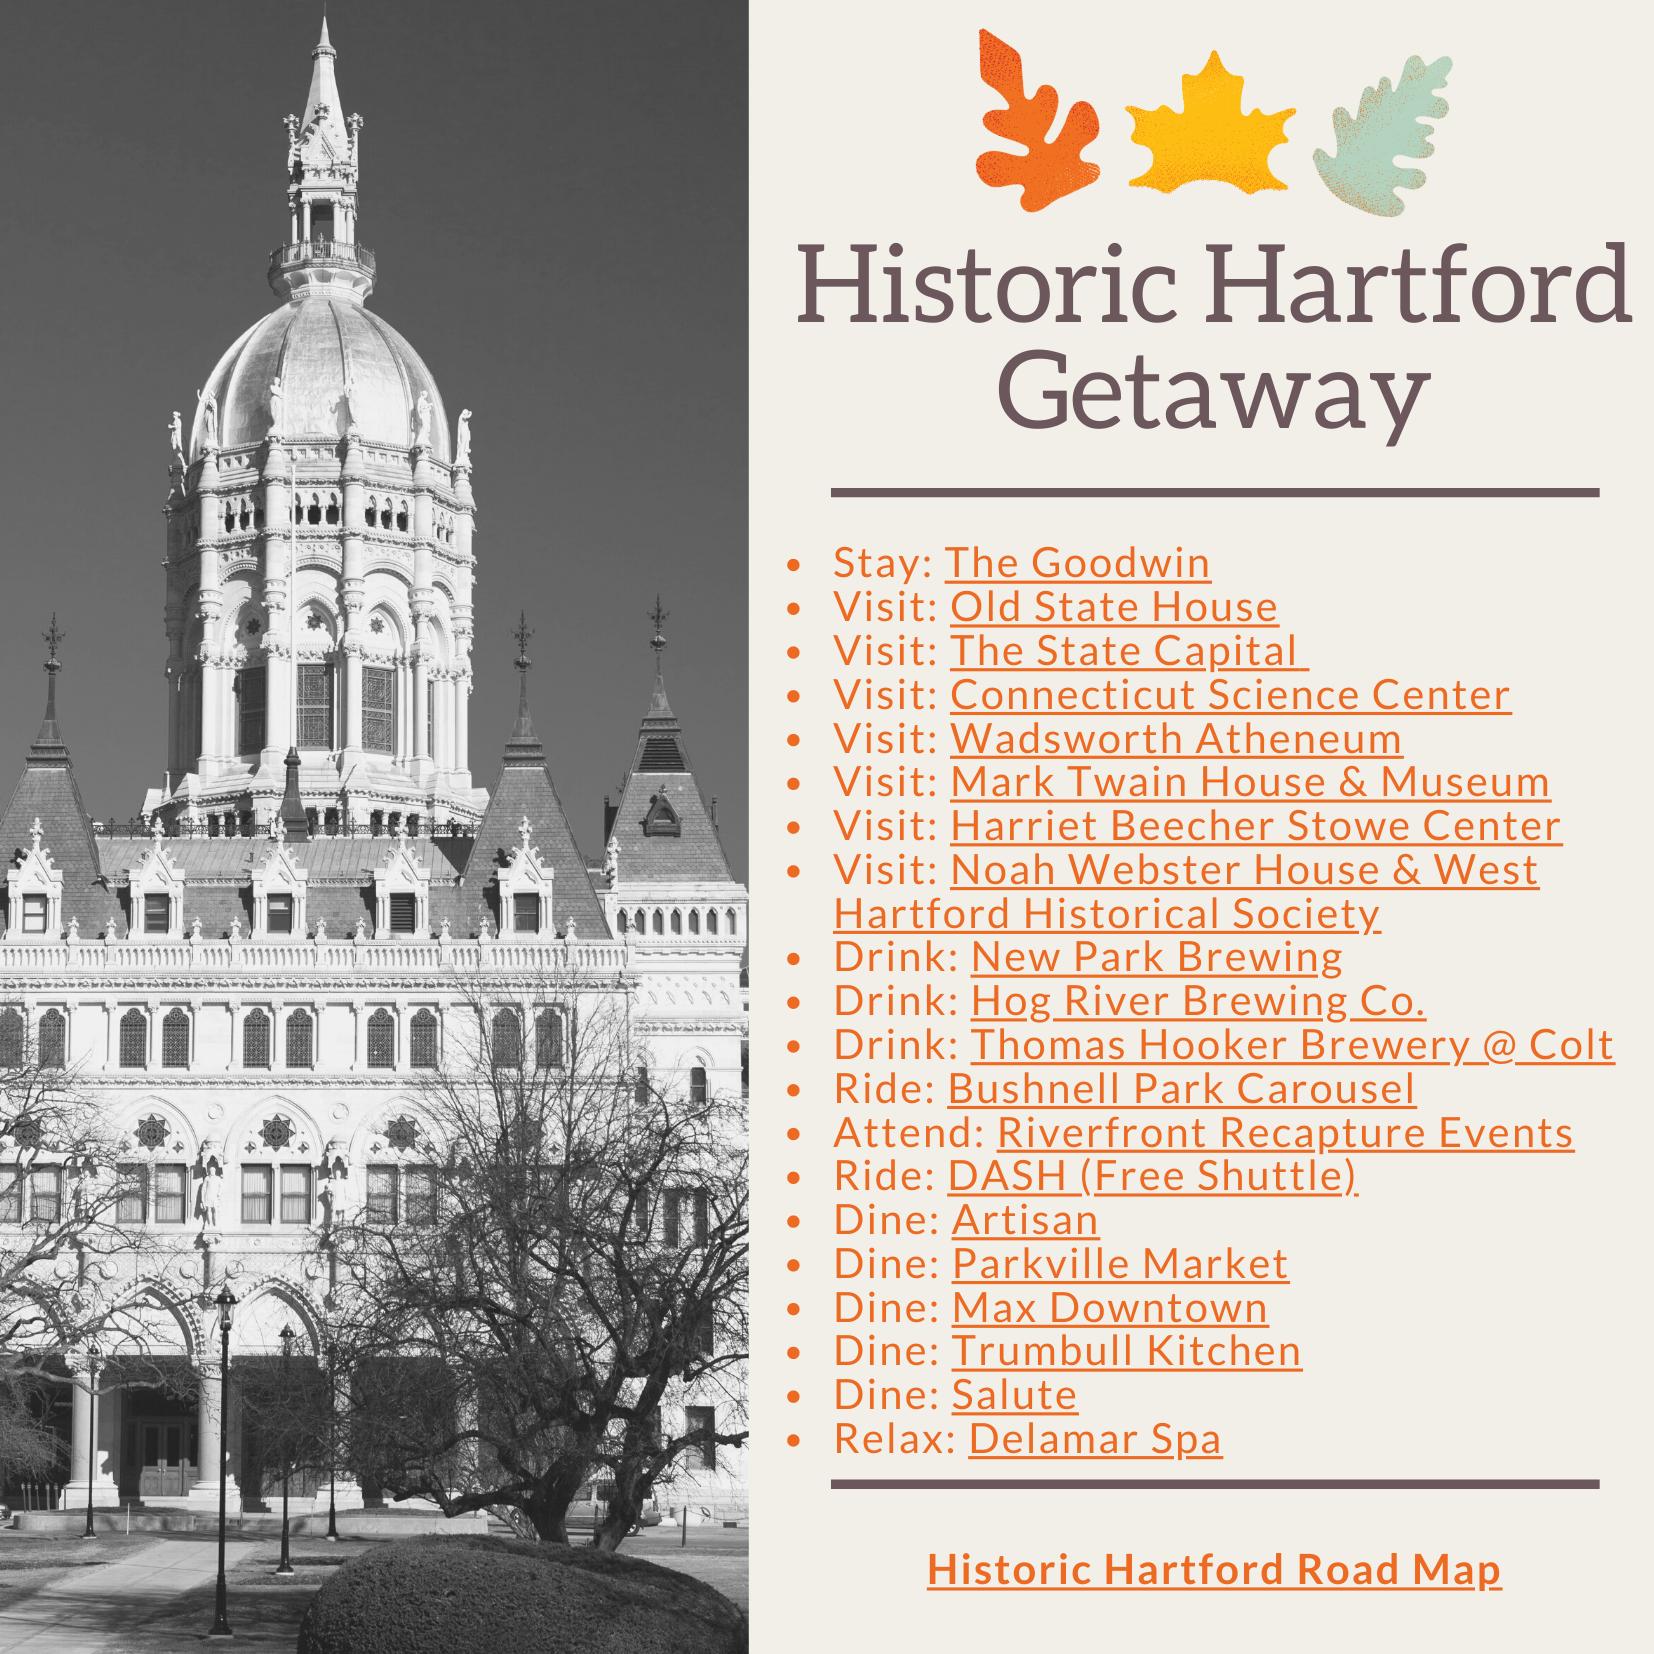 Historic Hartford Getaway